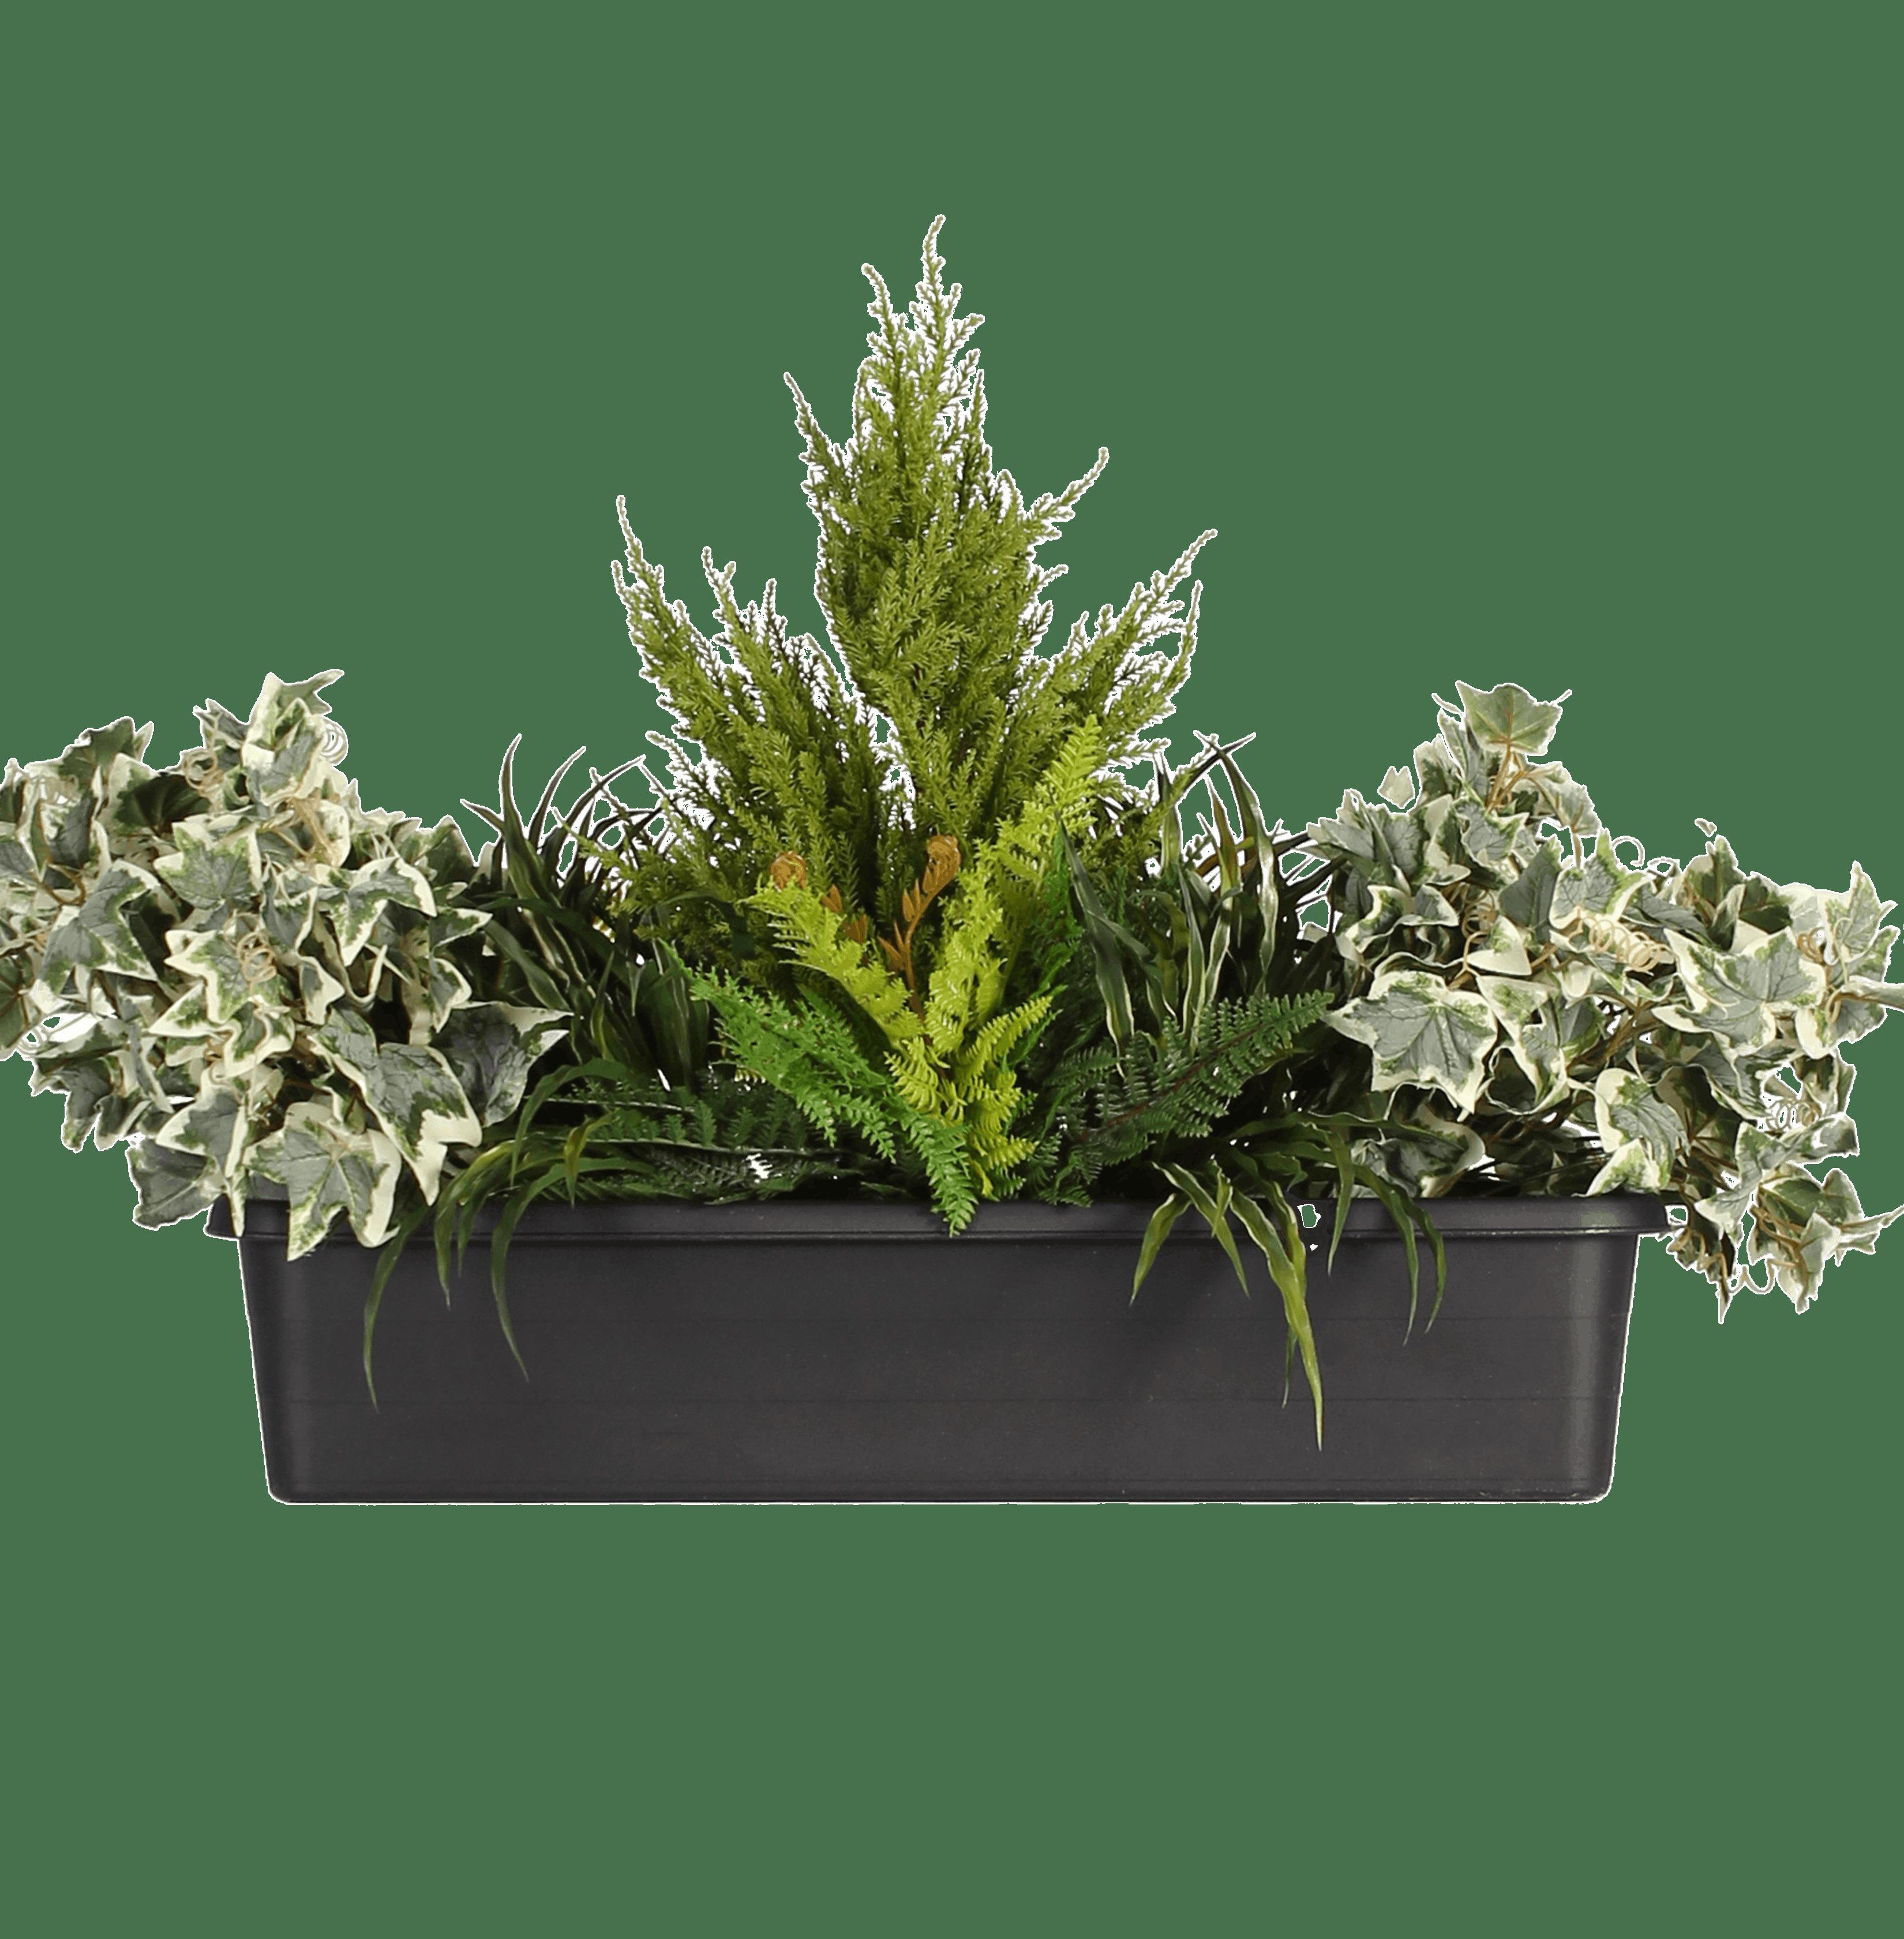 Artificial variegated foliage window box